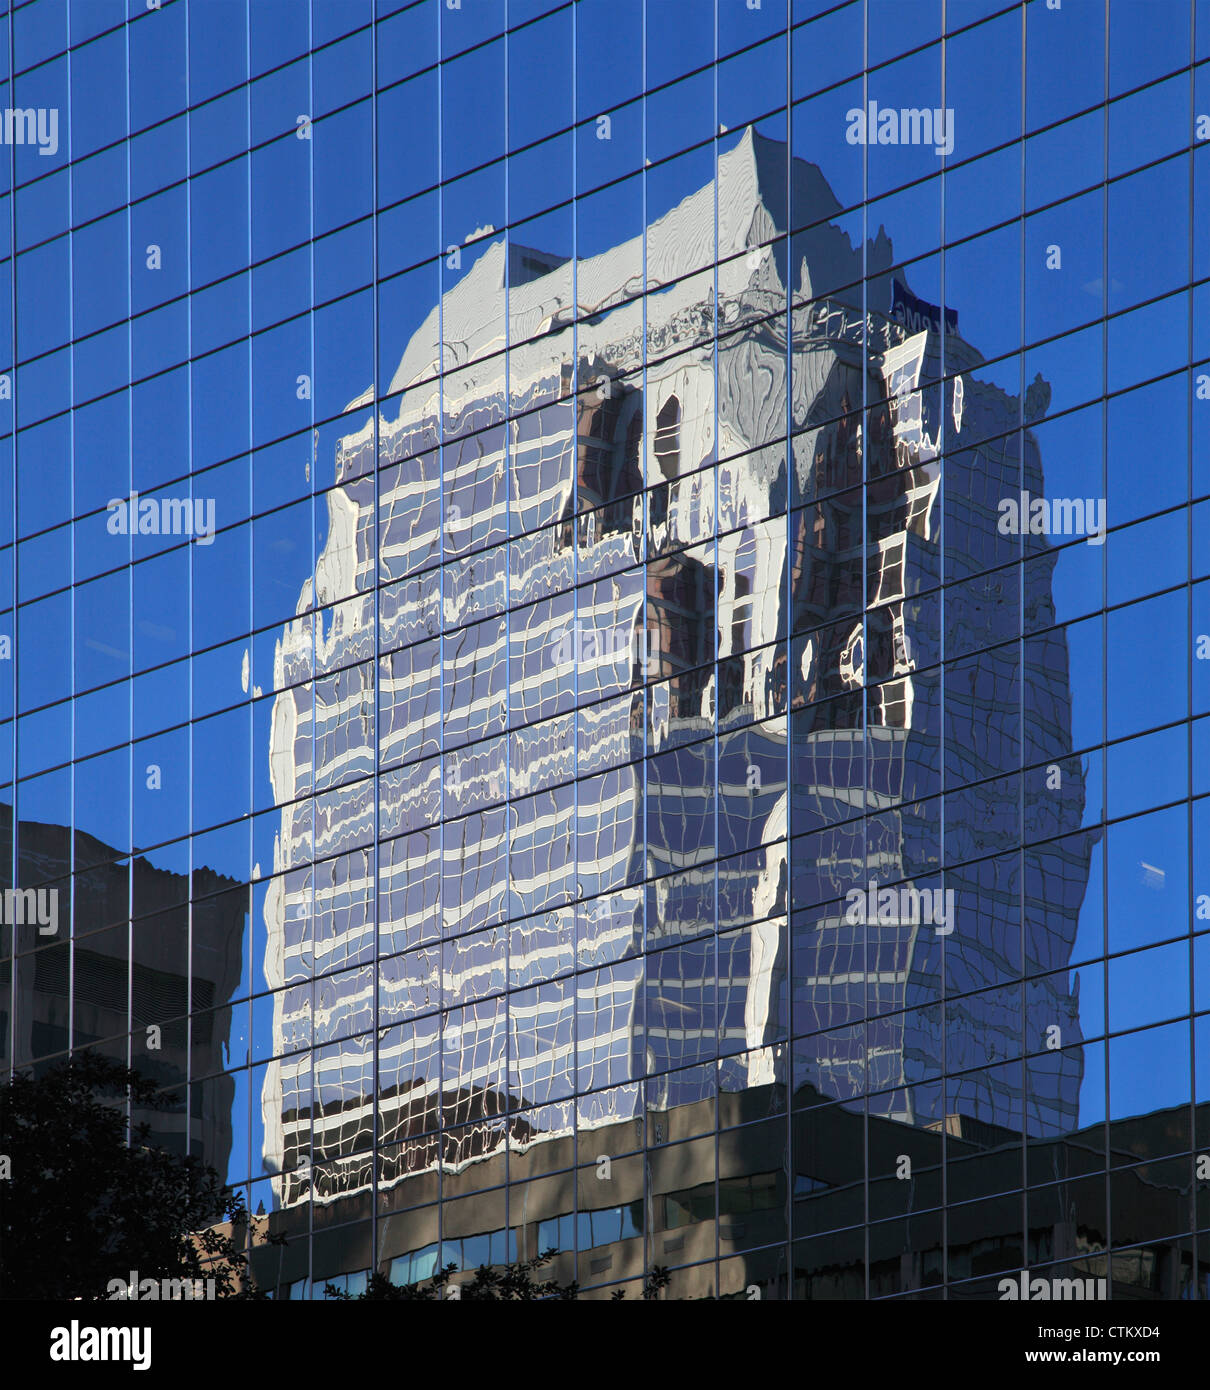 Canada, Quebec, Montreal, skyscraper, reflexion, - Stock Image